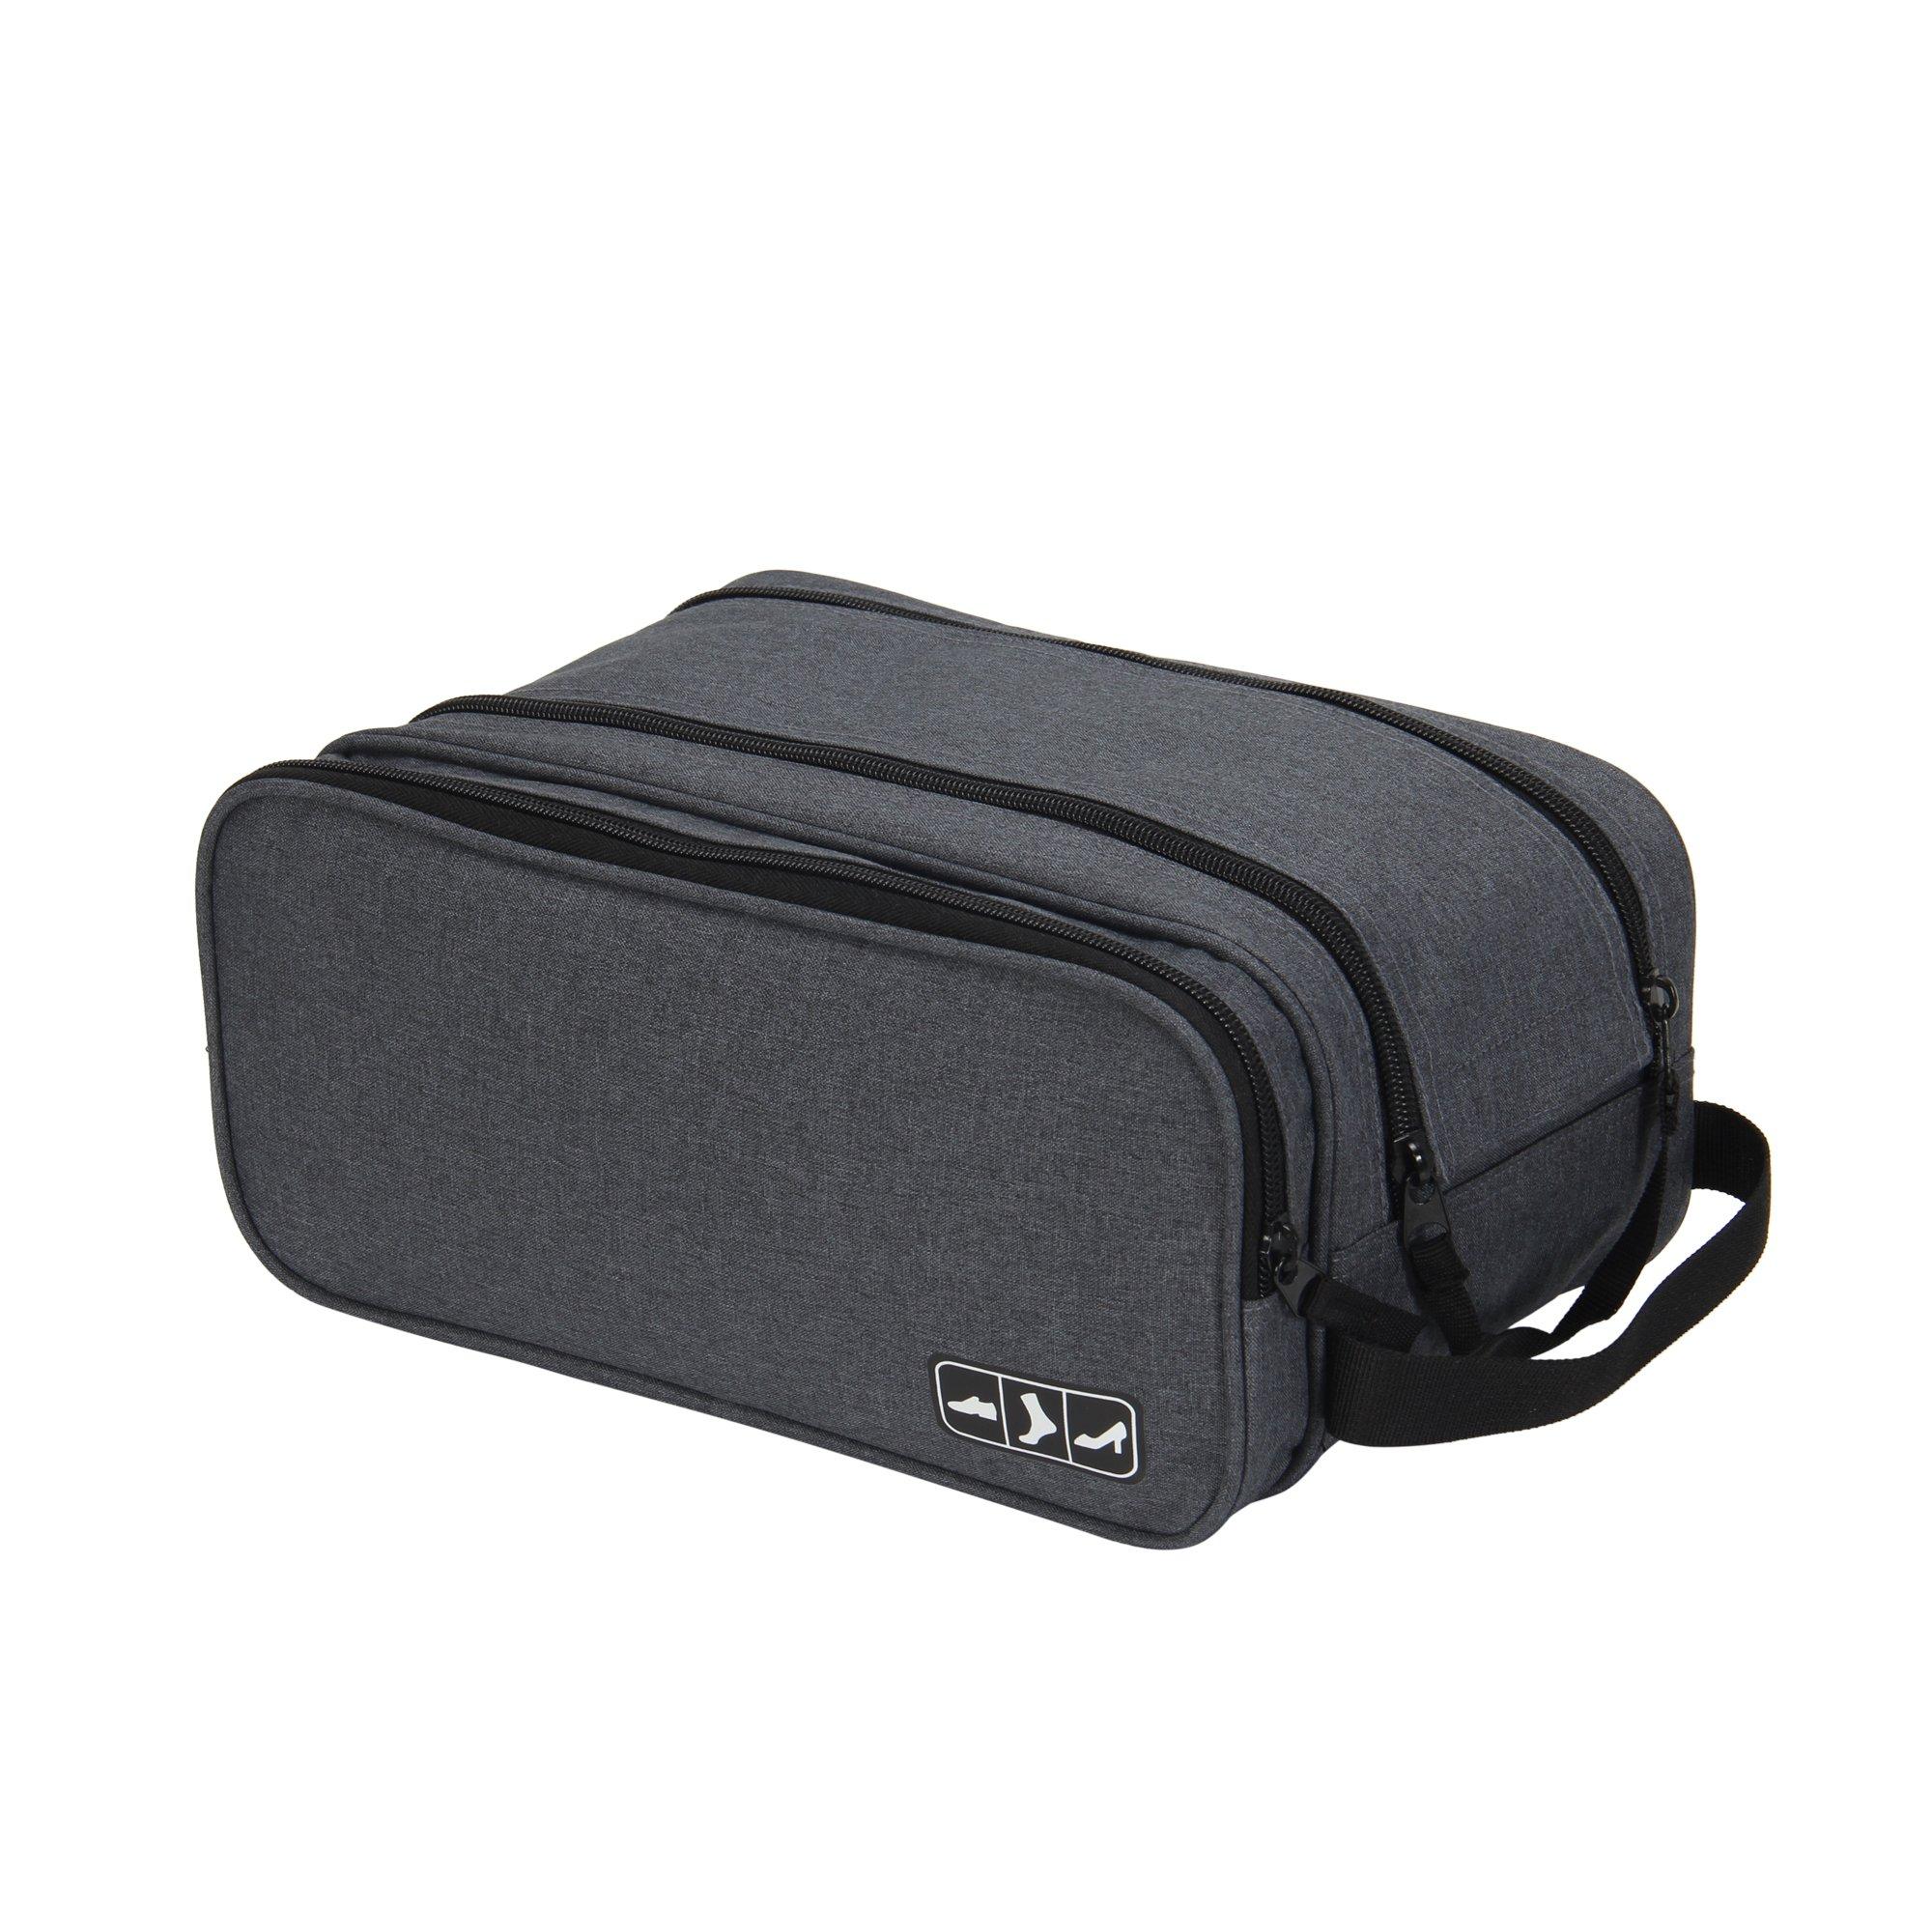 Hynes Eagle Portable Travel Gear Shoe Bags Pouch Grey